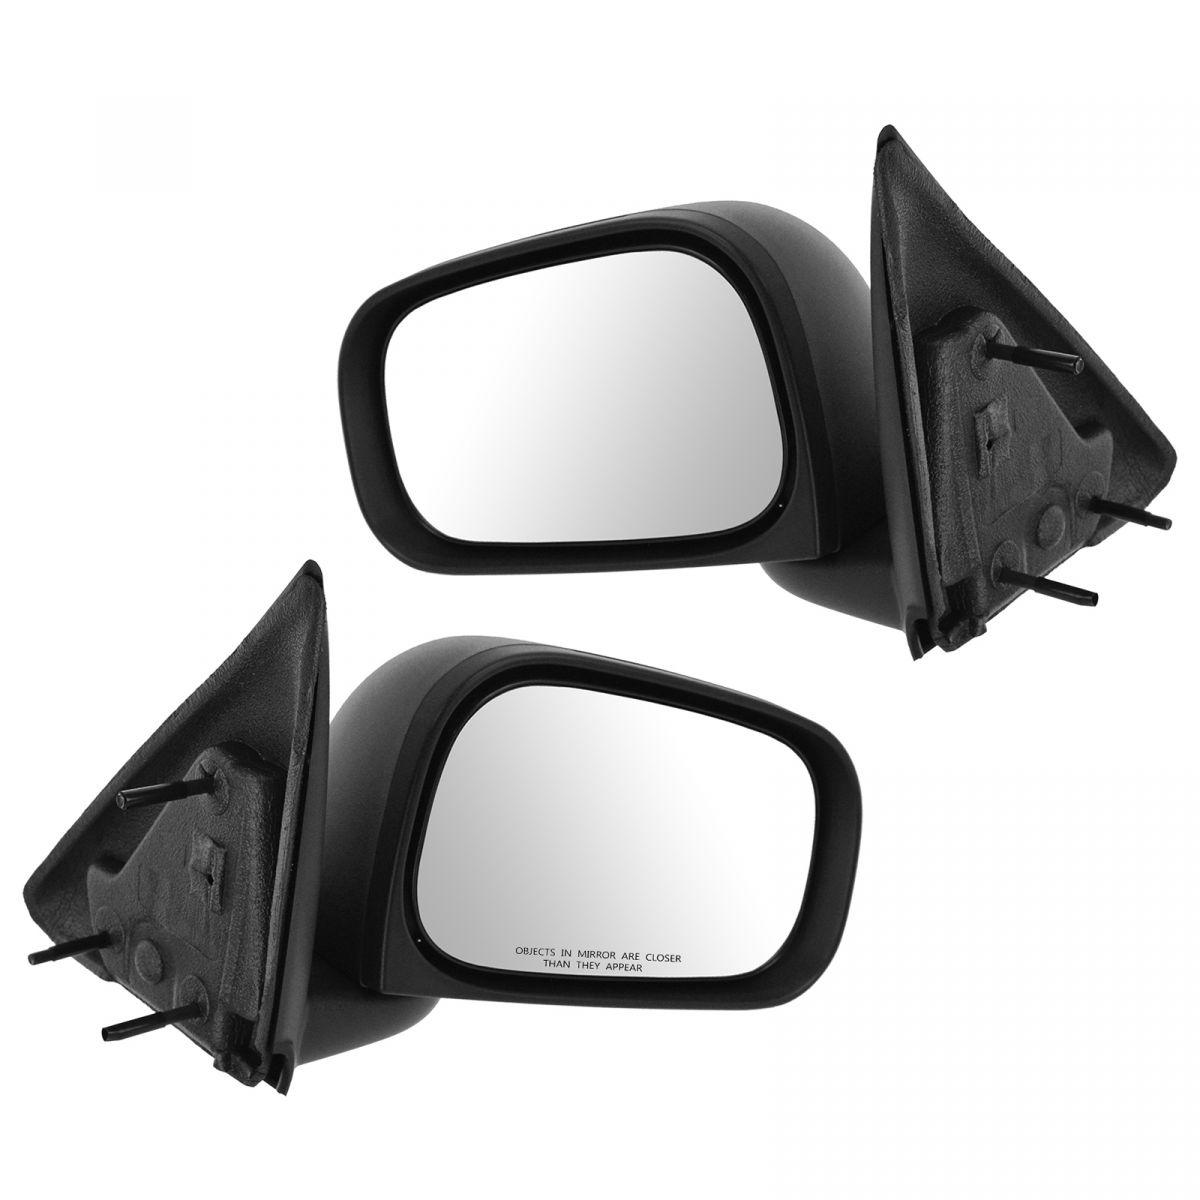 Mirror Manual Textured Black Folding RH LH Right Left PAIR Set for Dakota Raider